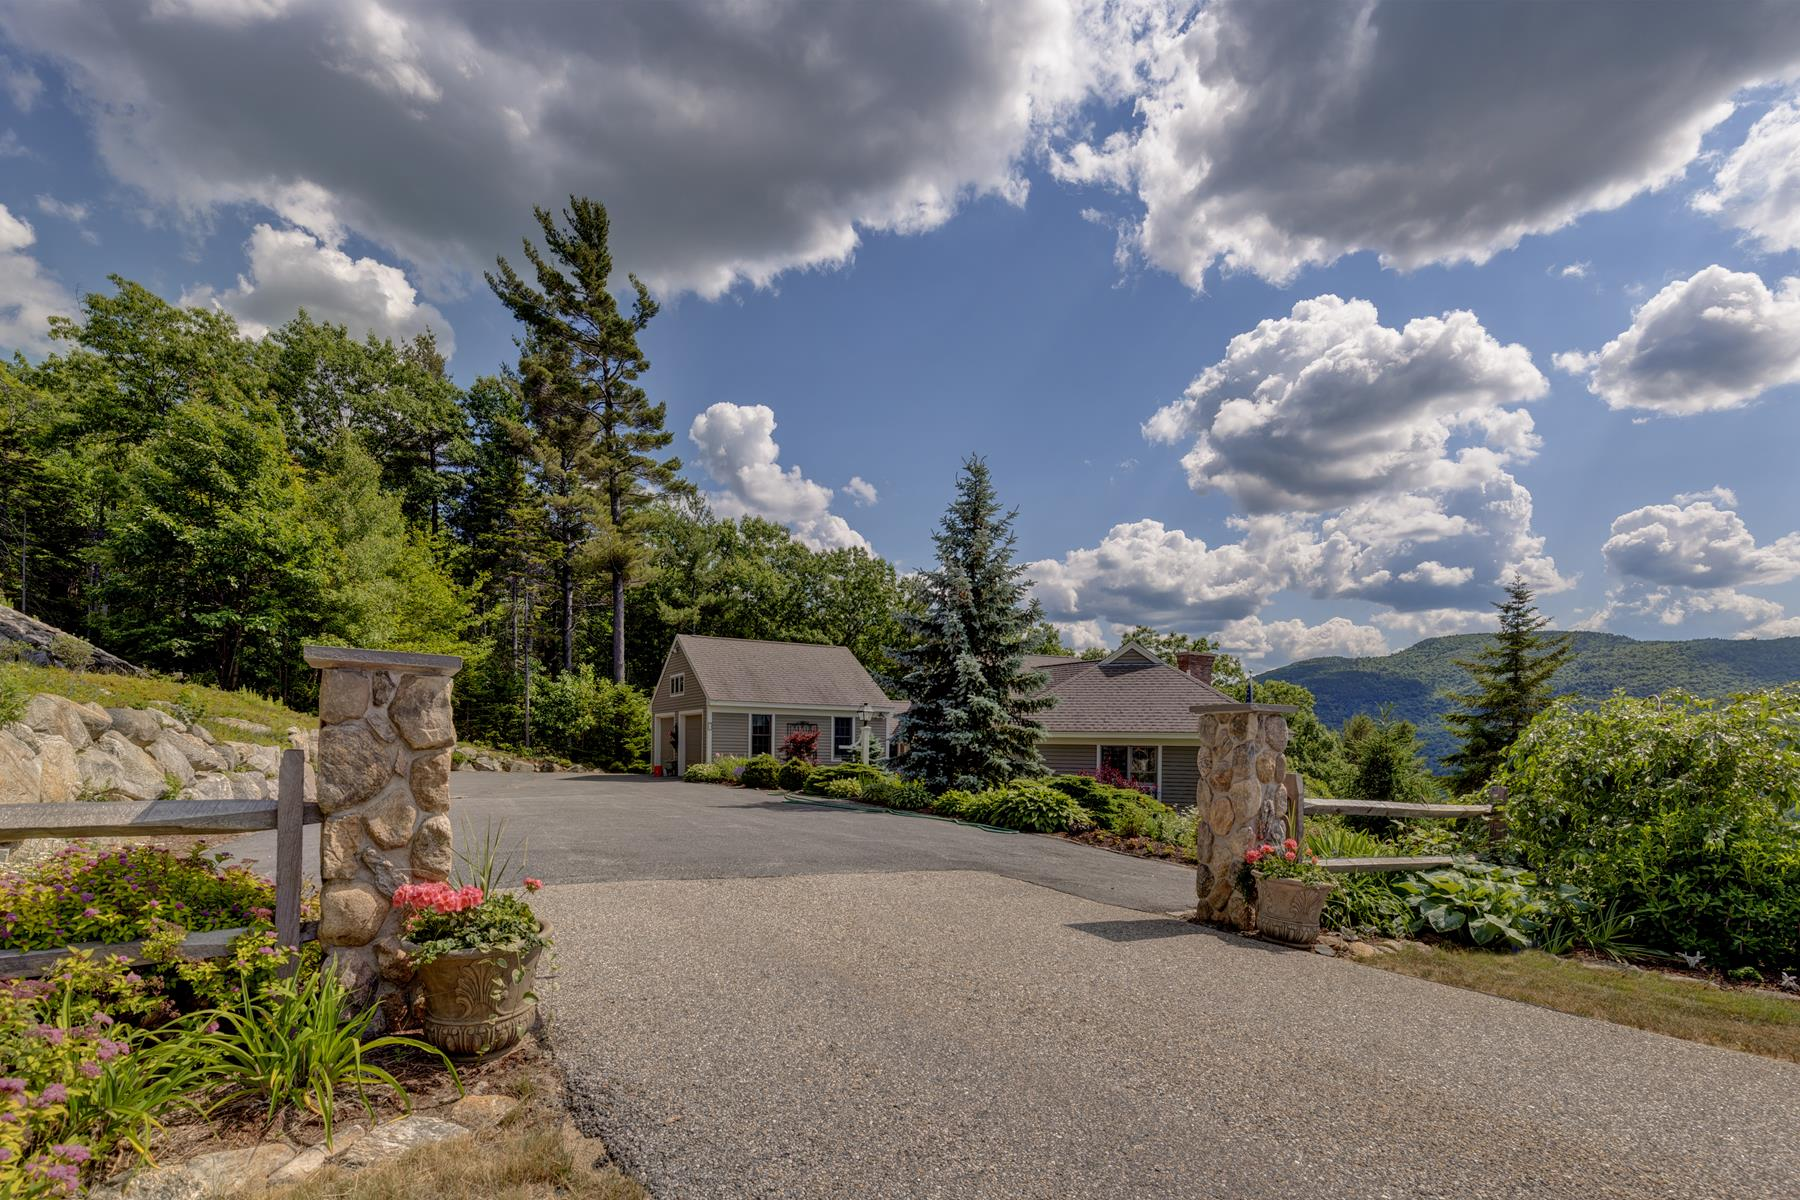 Moradia para Venda às 21 Blye Hill Landing North, Newbury Newbury, New Hampshire, 03255 Estados Unidos